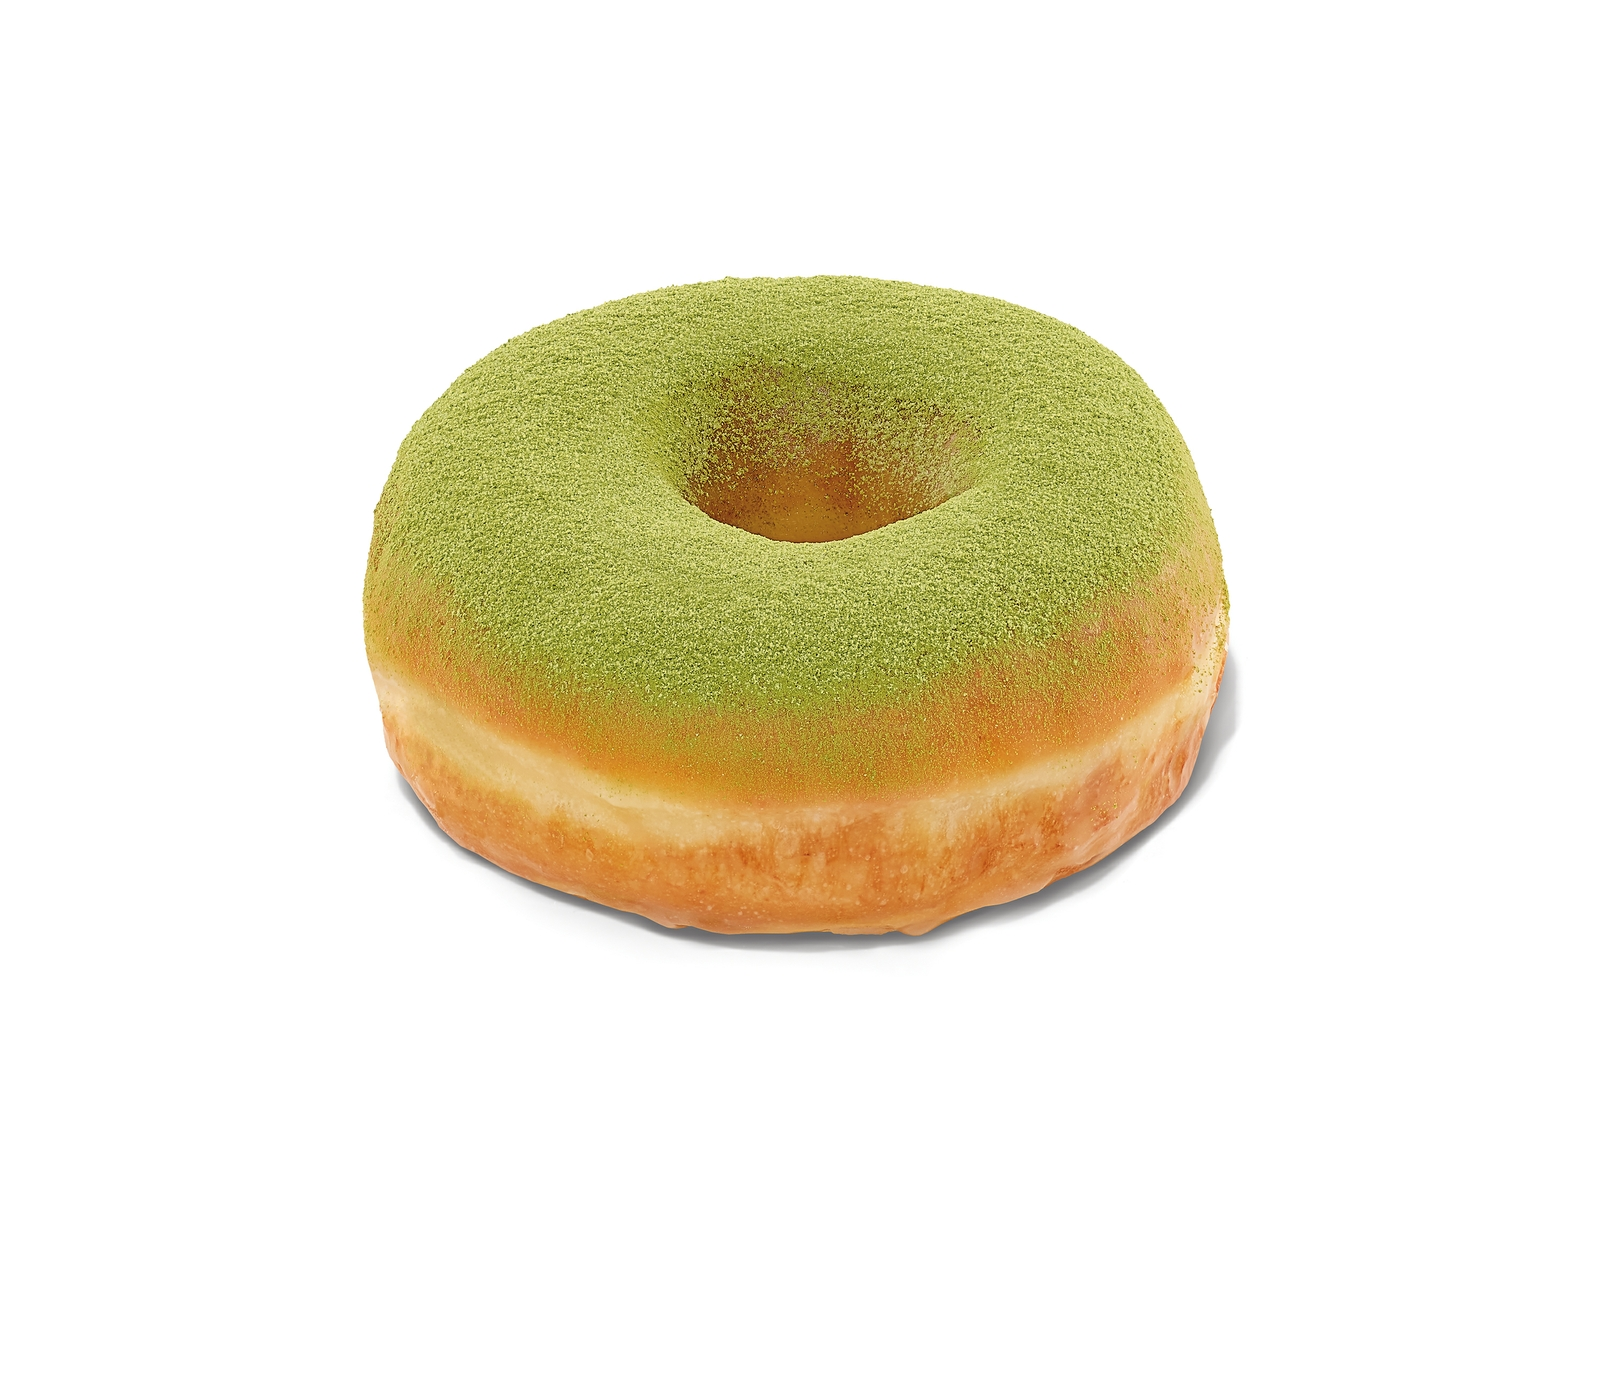 Matcha Topped Donut